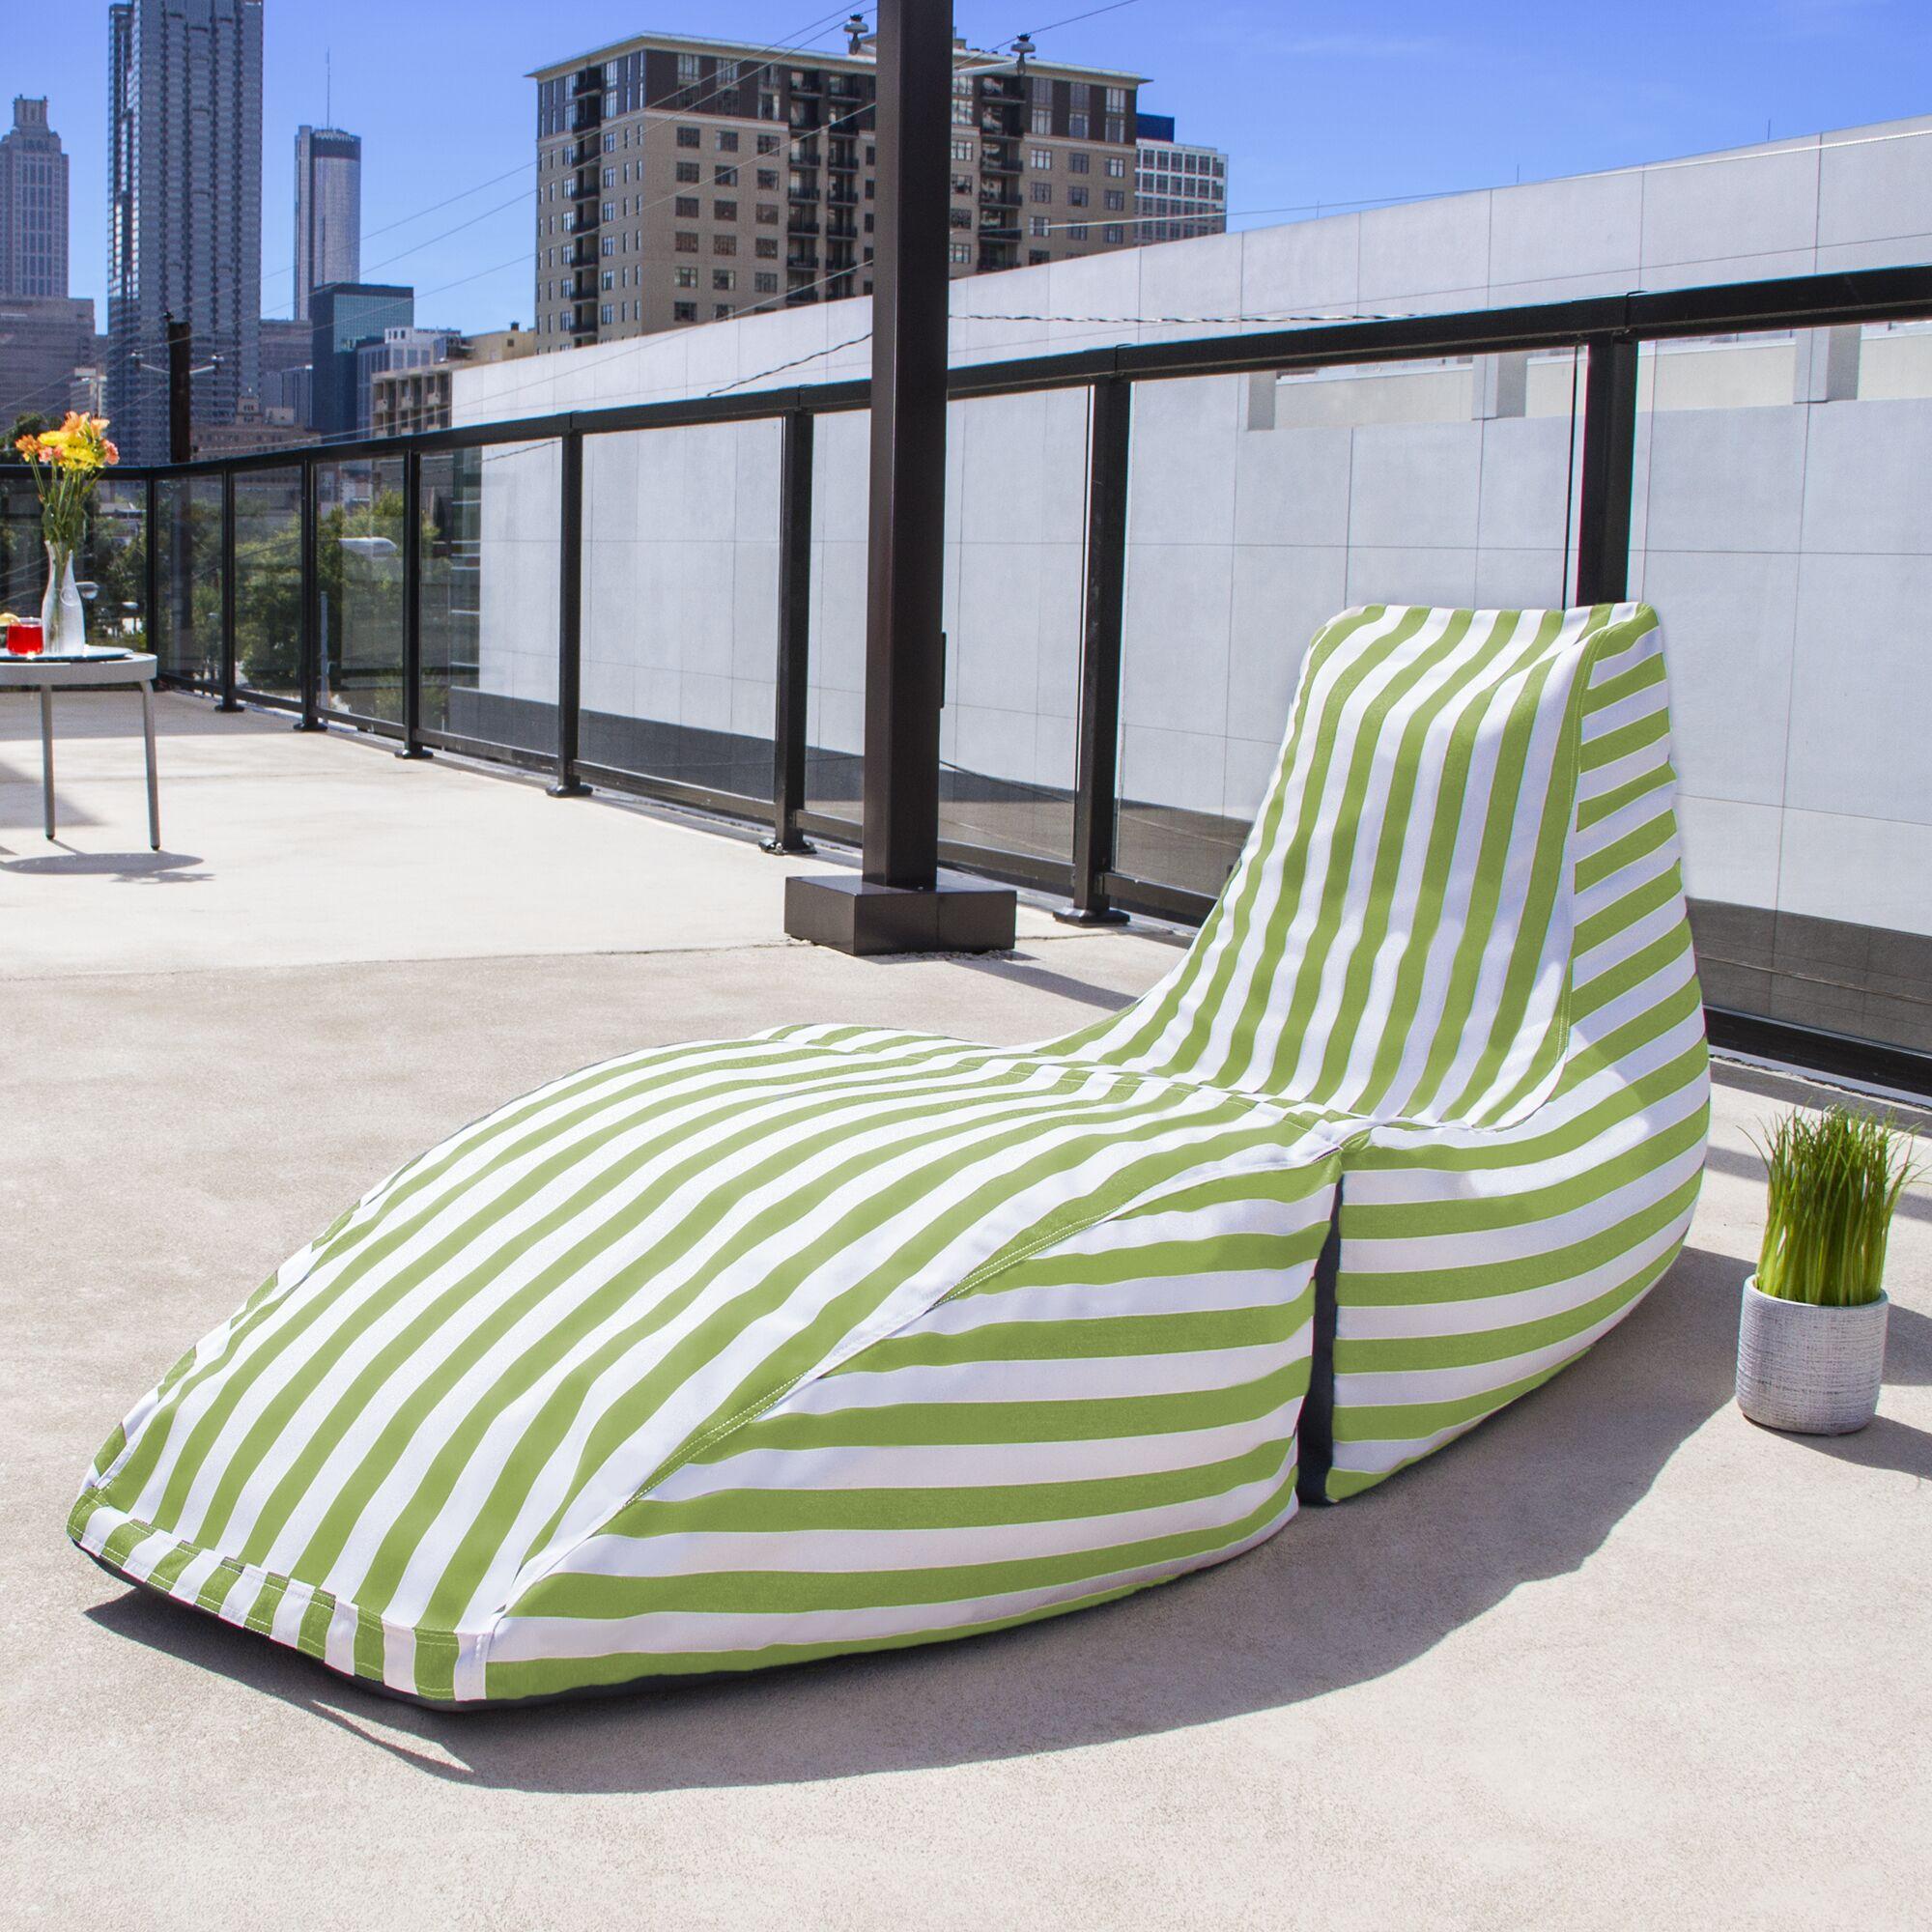 Prado Outdoor Striped Bean Bag Chaise Lounge Chair Color: Lime Stripe